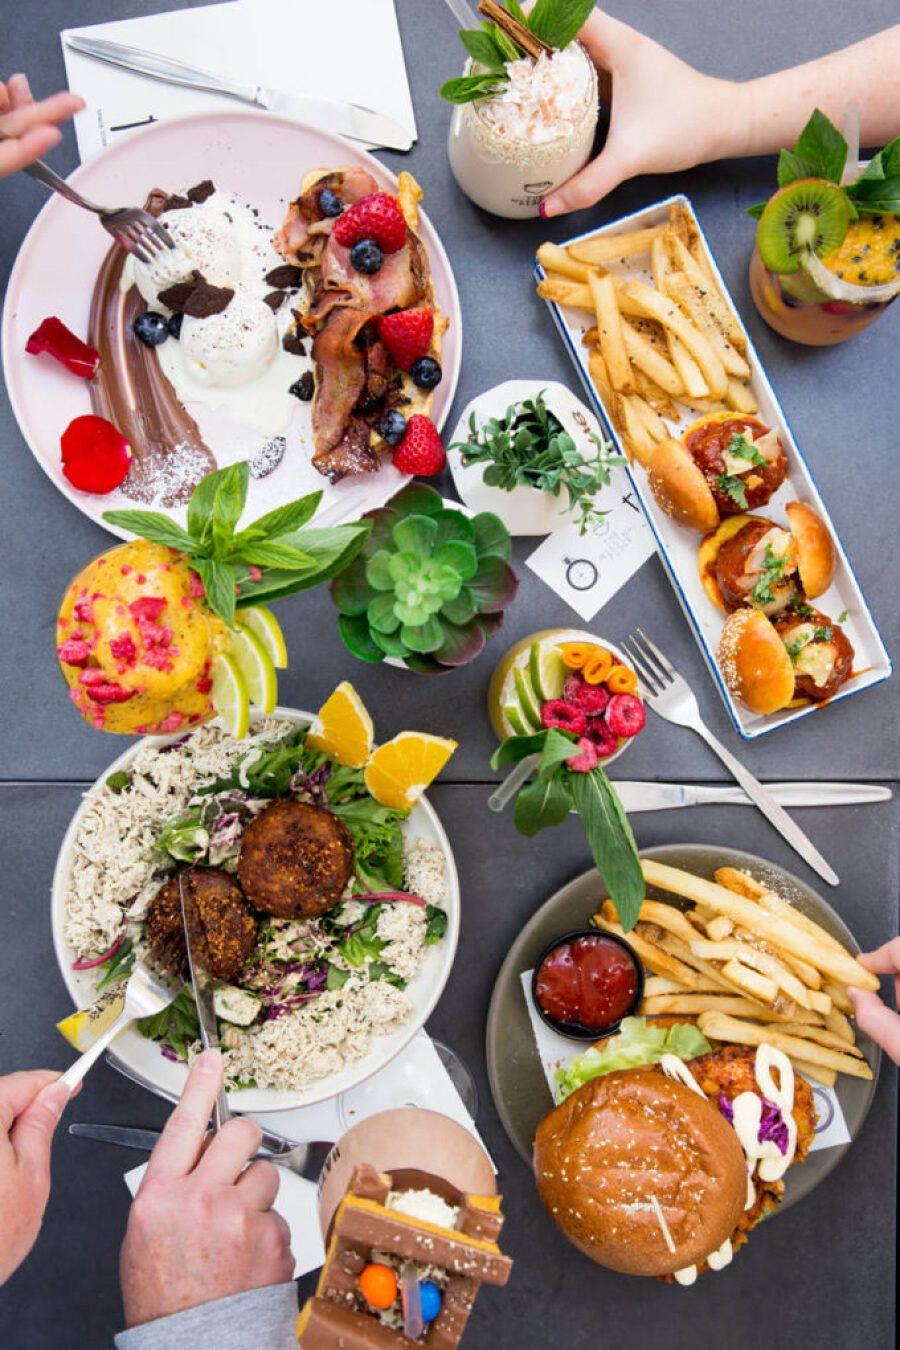 Sydney Dining Guide: Hattrick, amazing food